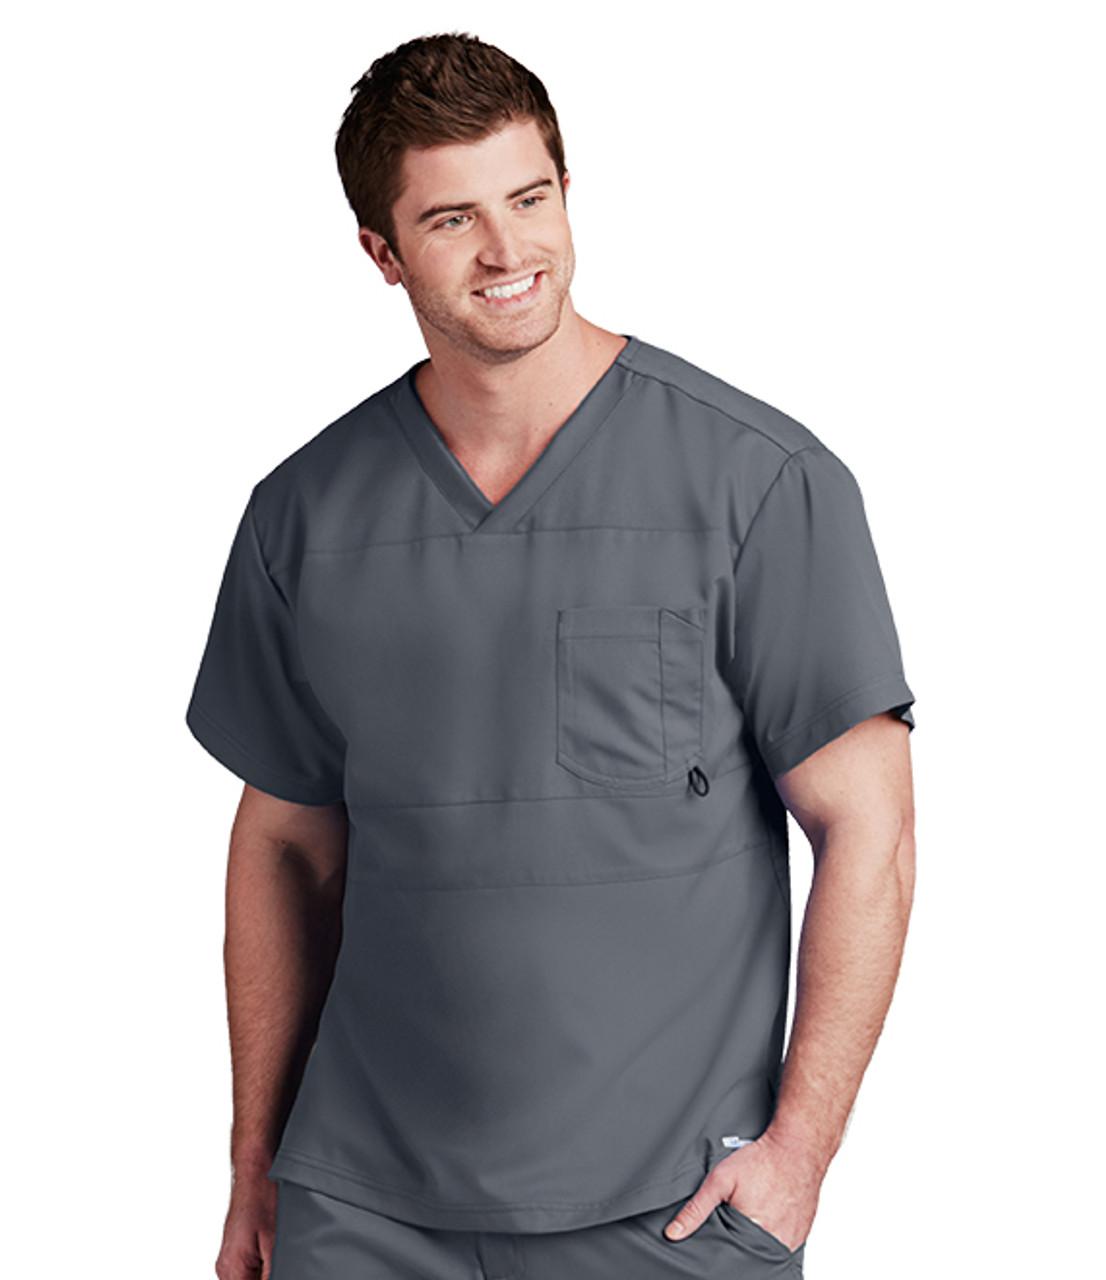 0116 Greys Anatomy Active Scrubs V Neck 2 Pocket Scrub Top